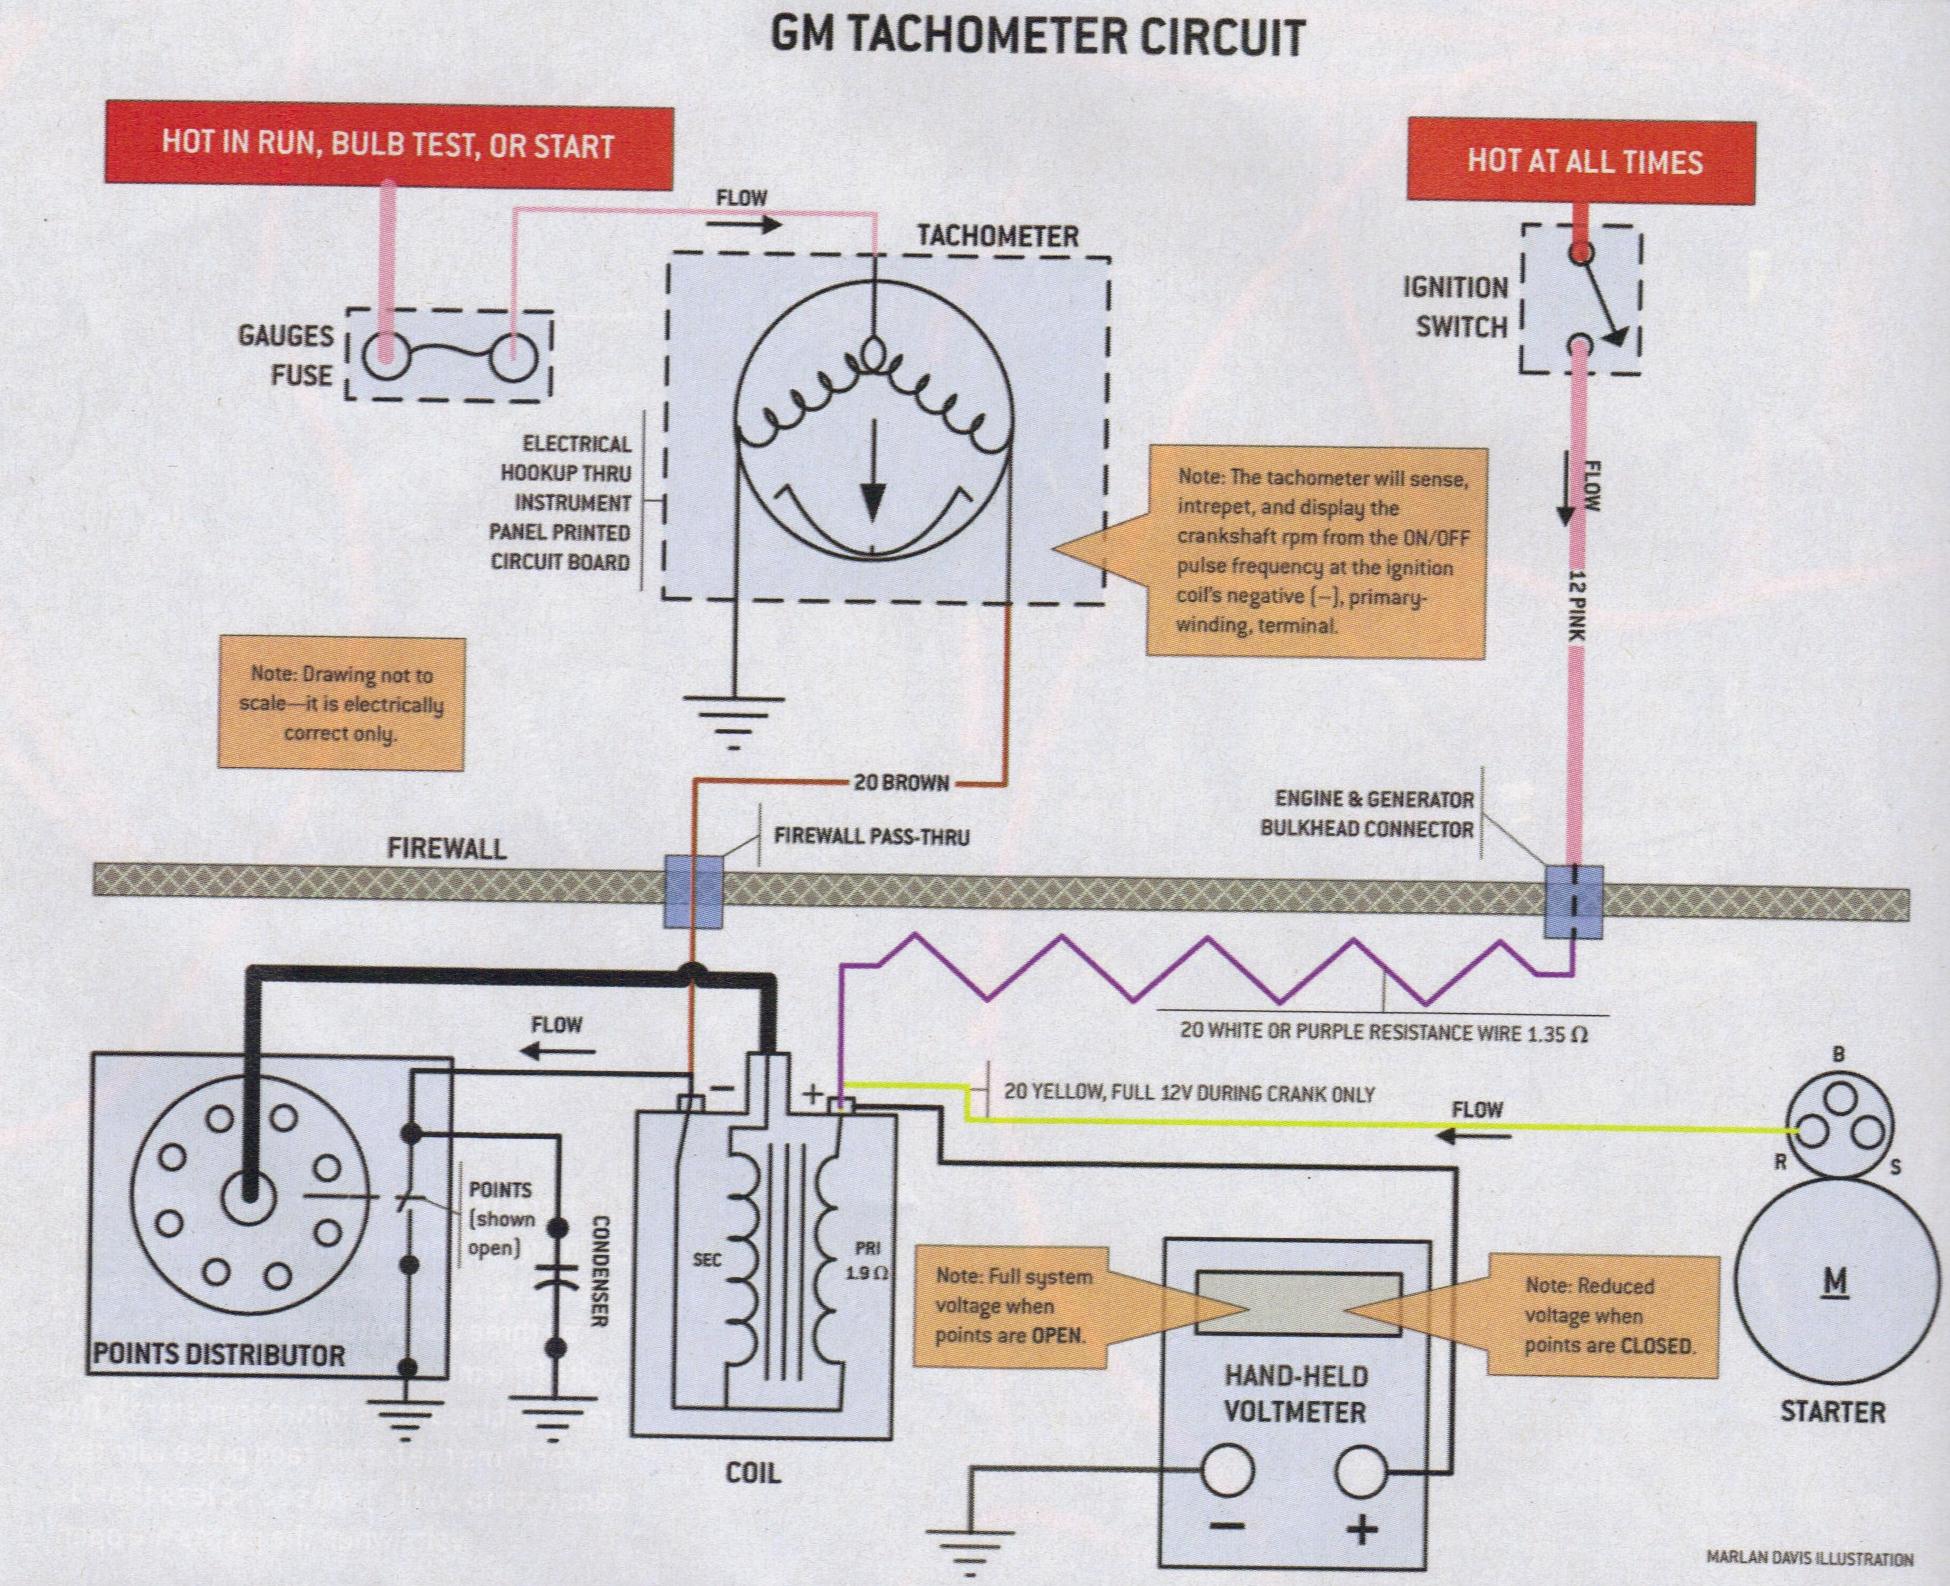 1969 camaro factory tach wiring diagram wiring diagram 68 camaro 350